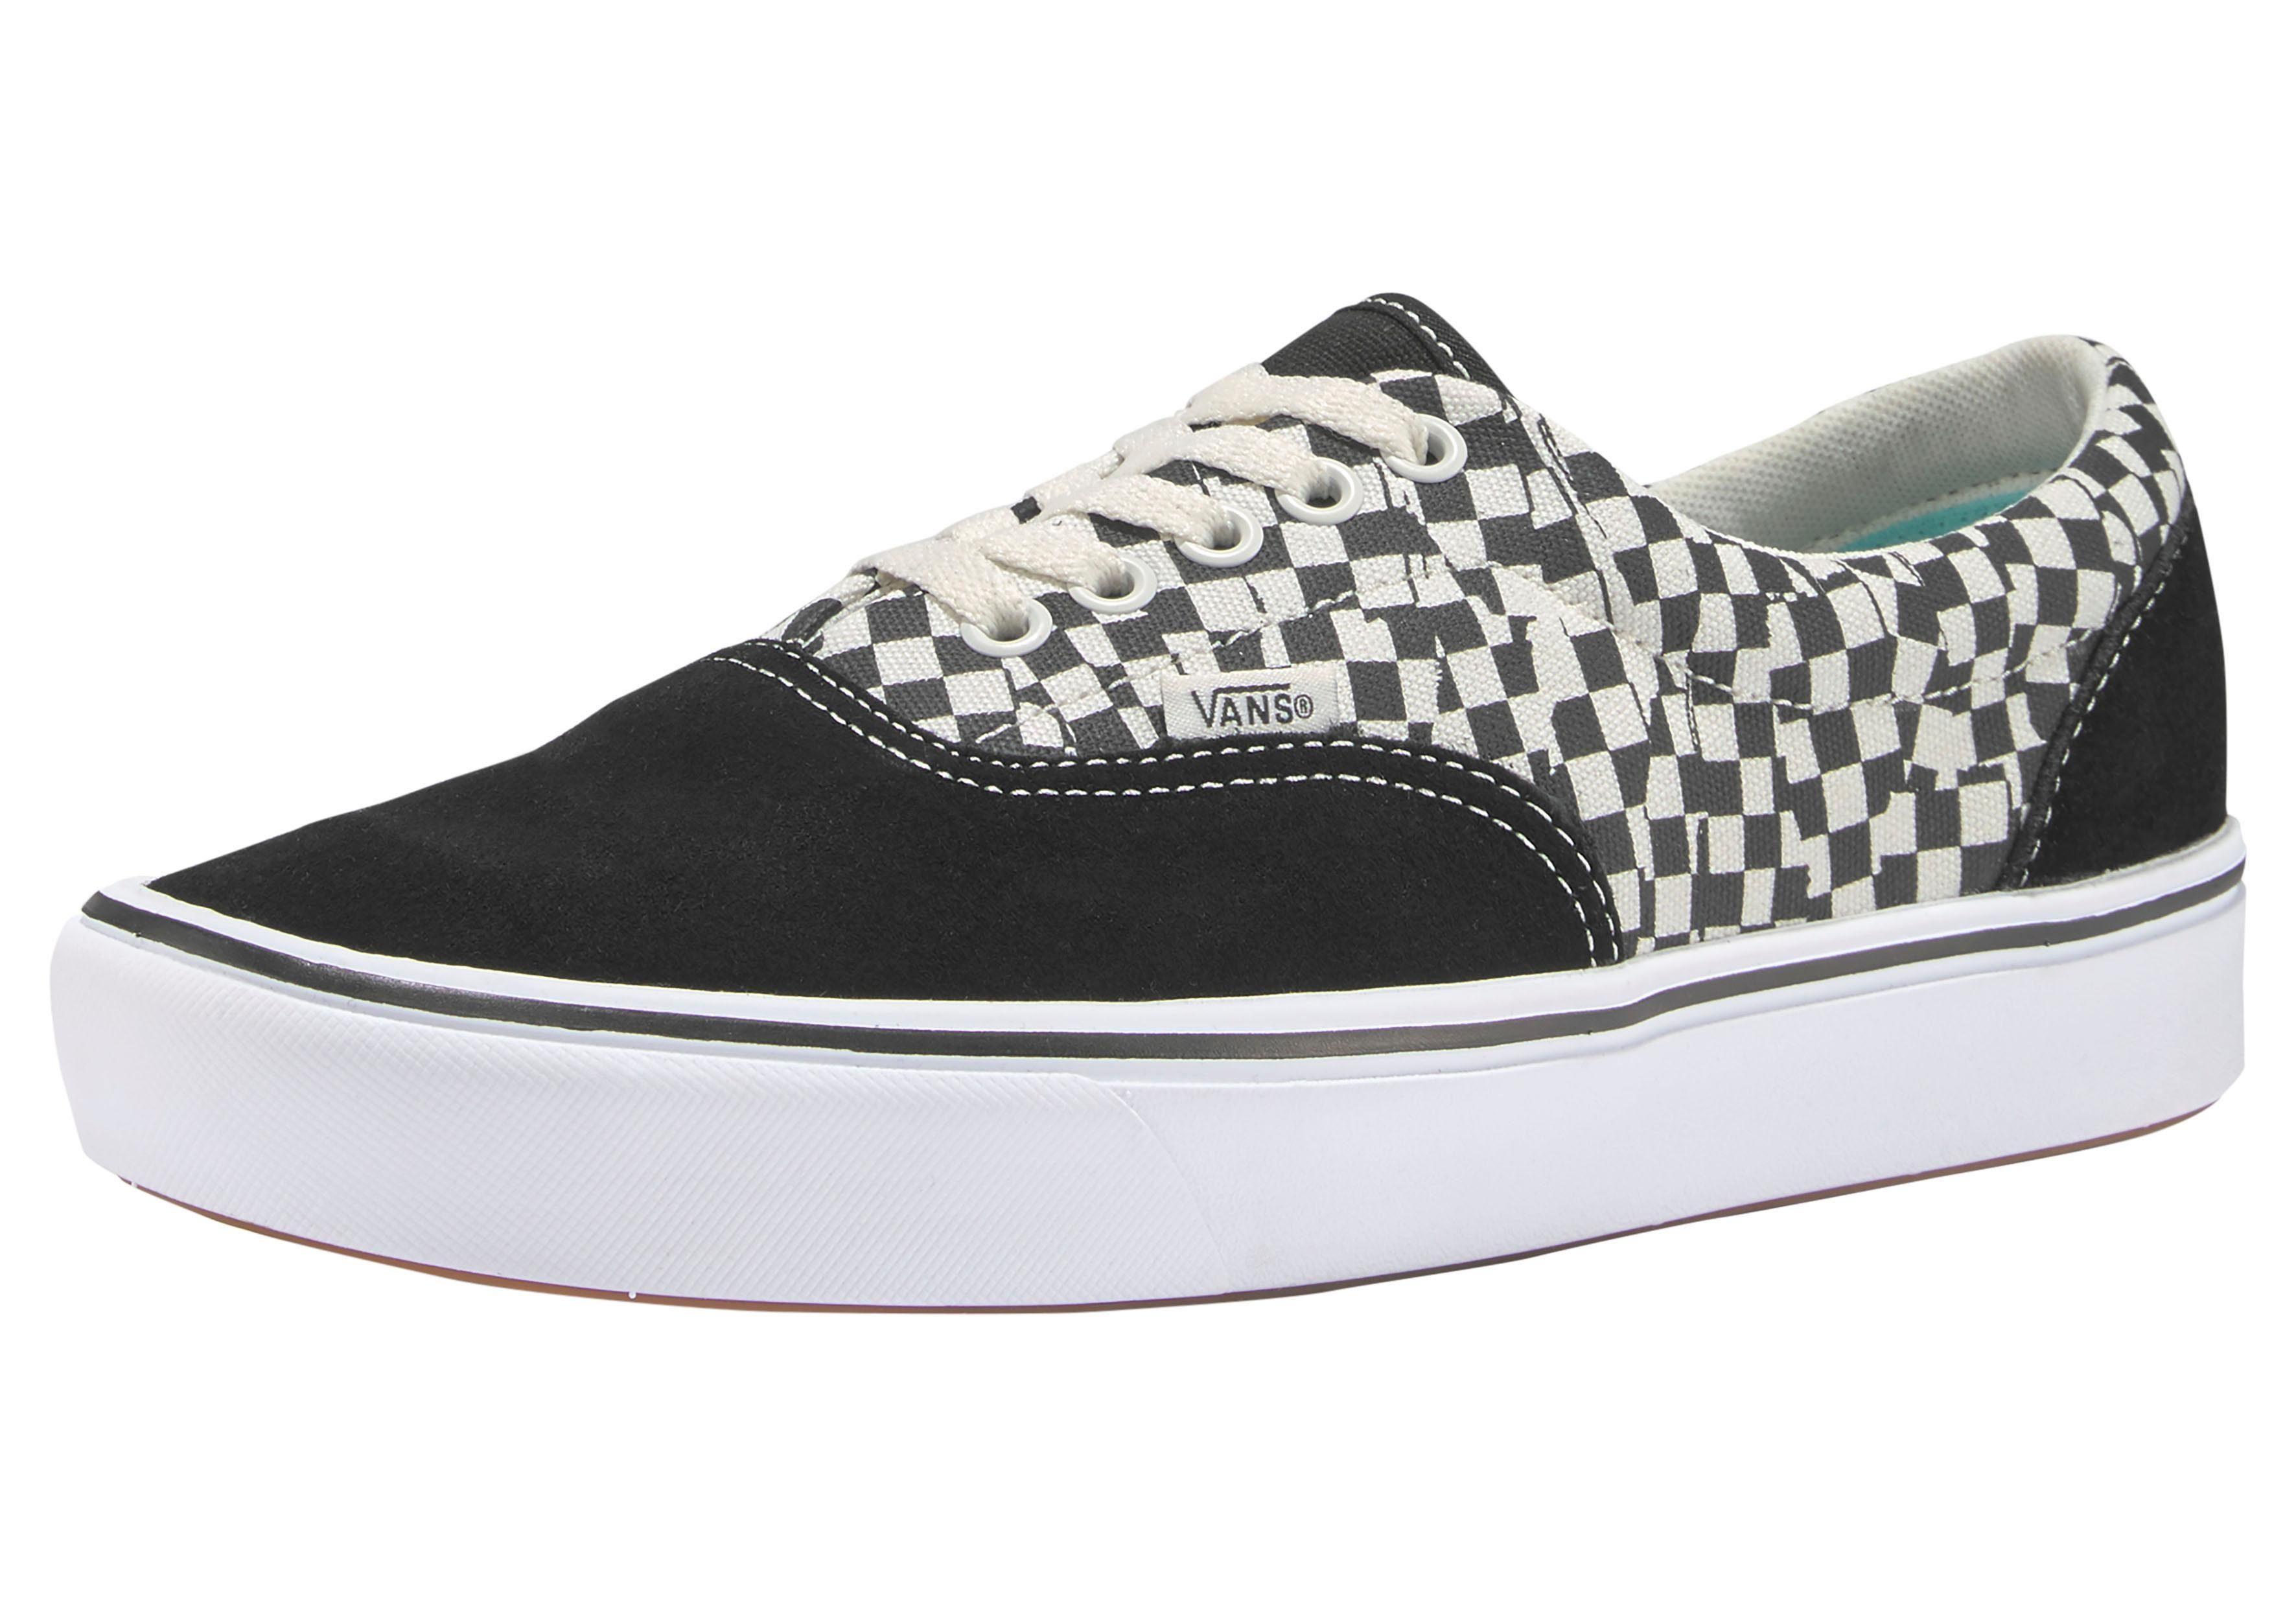 Vans »ComfyCush Era« Sneaker, Trendiger Sneaker von VANS online kaufen | OTTO